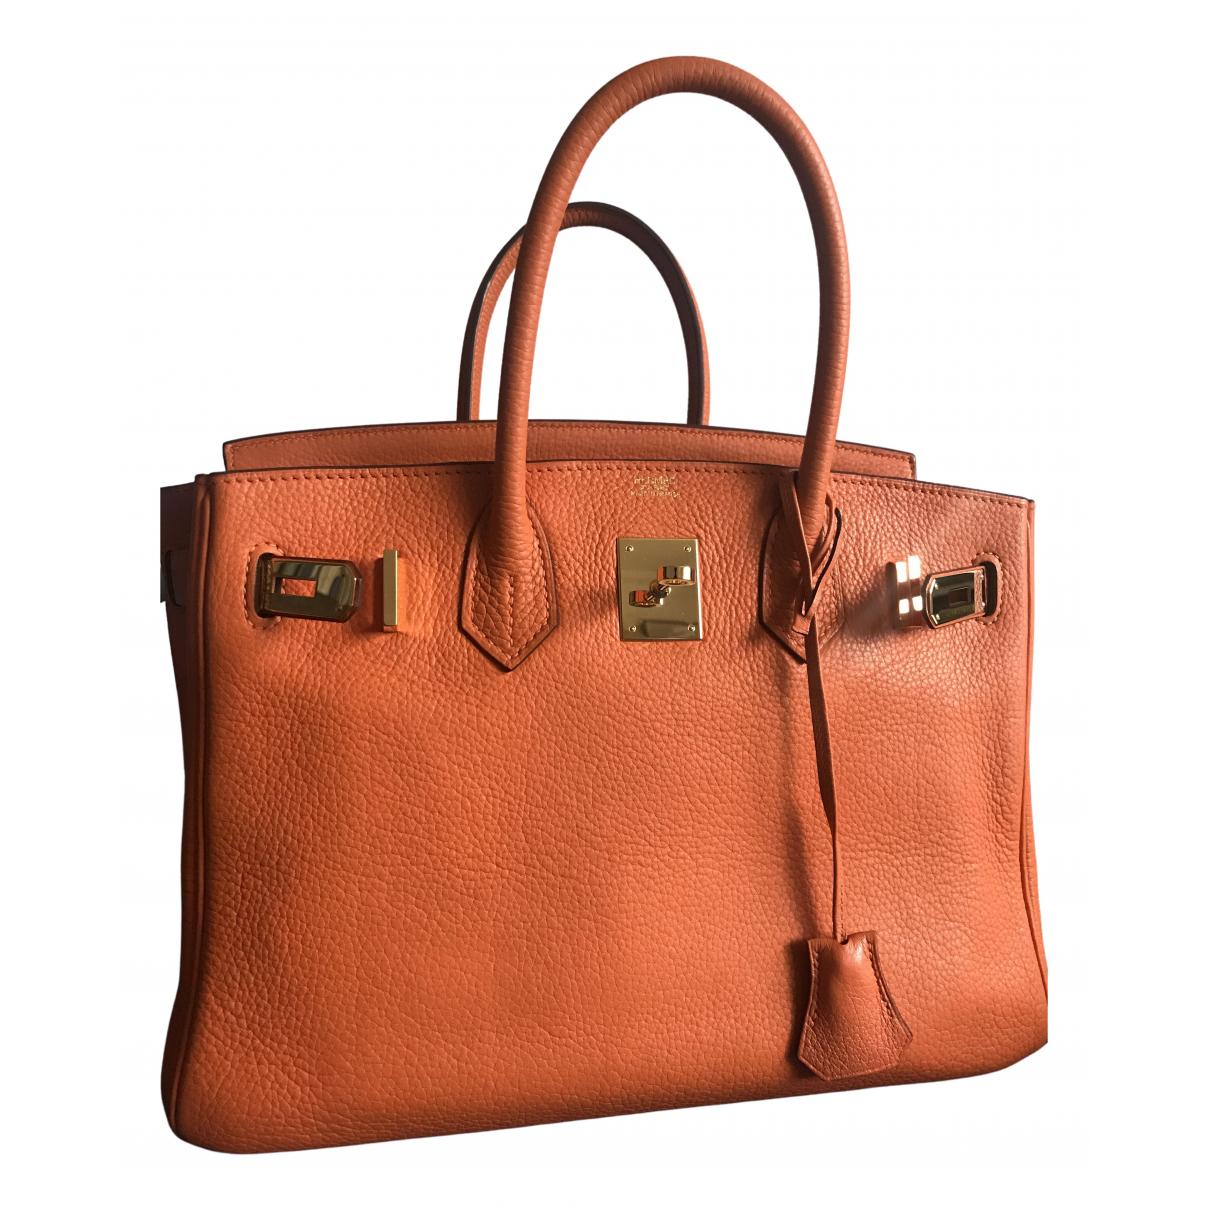 Hermes Birkin 30 Handtasche in  Orange Leder